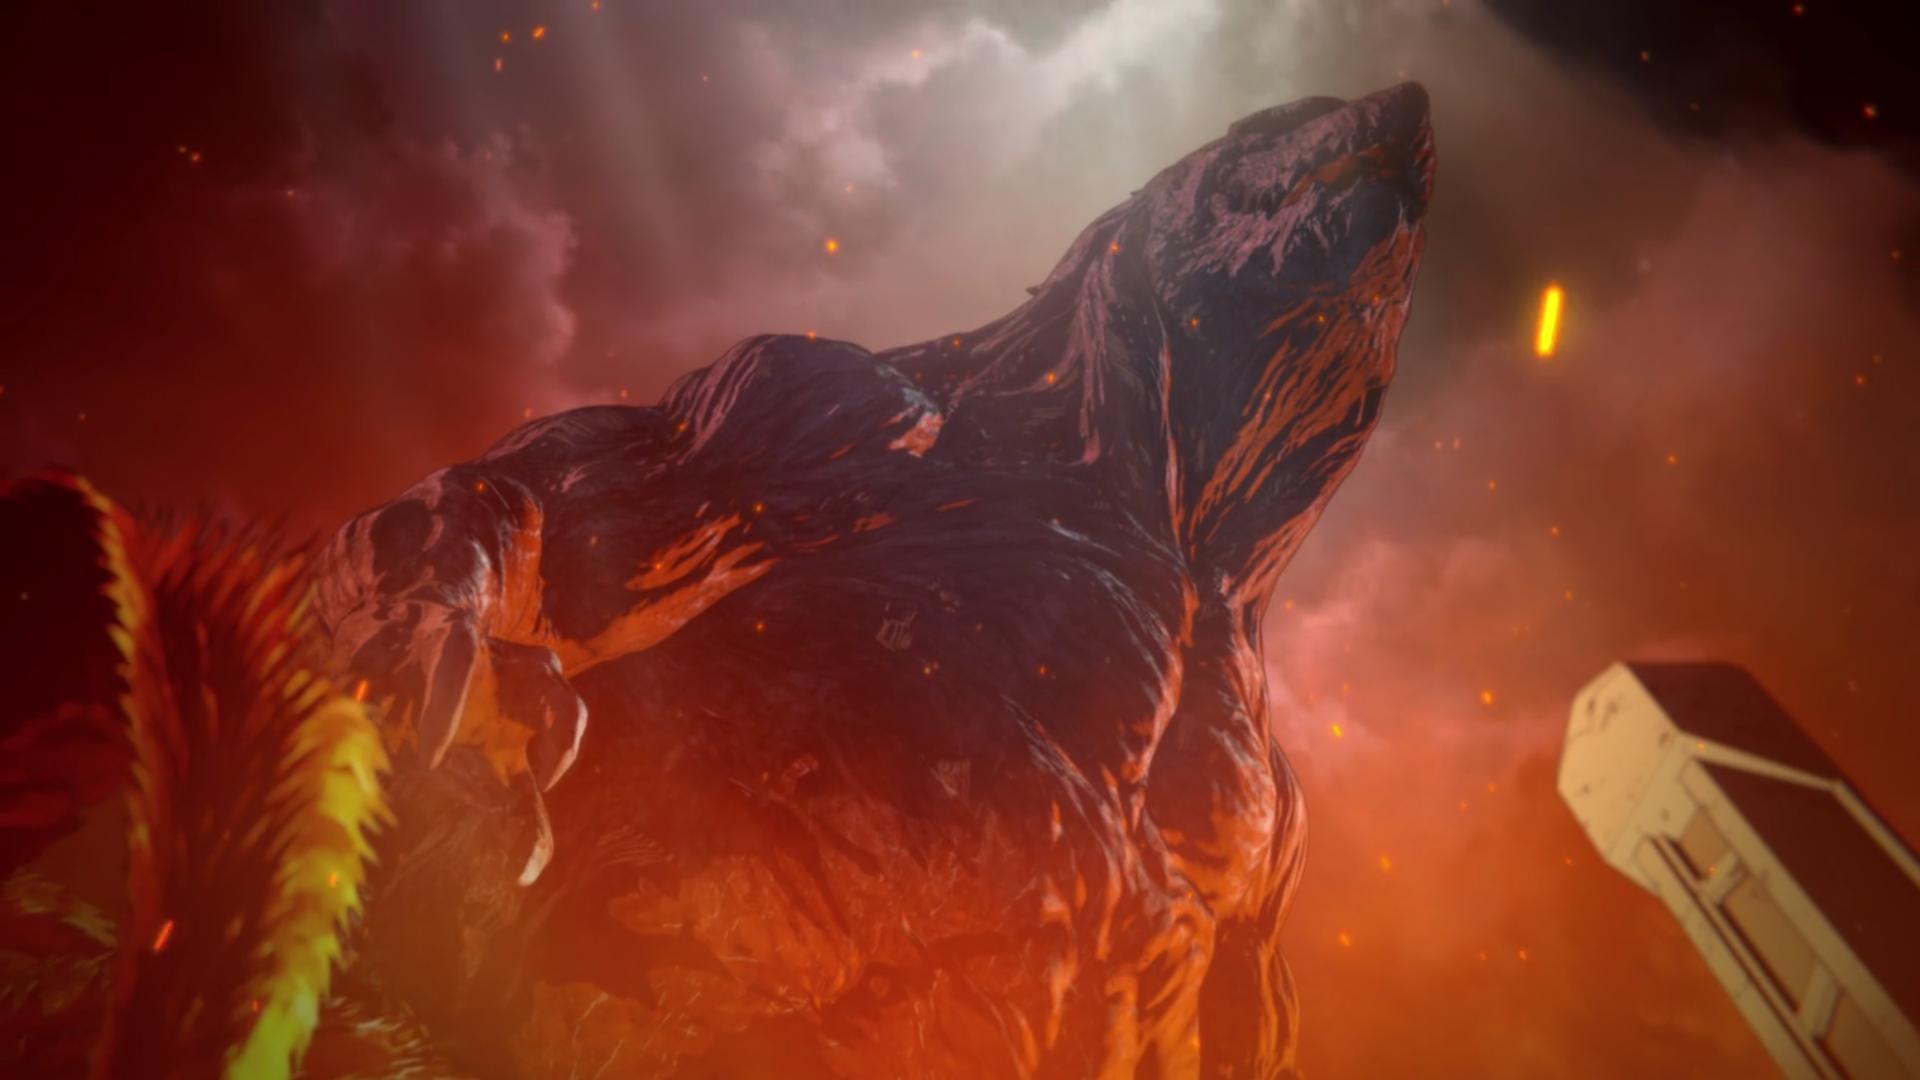 GodzillaAnime01_002